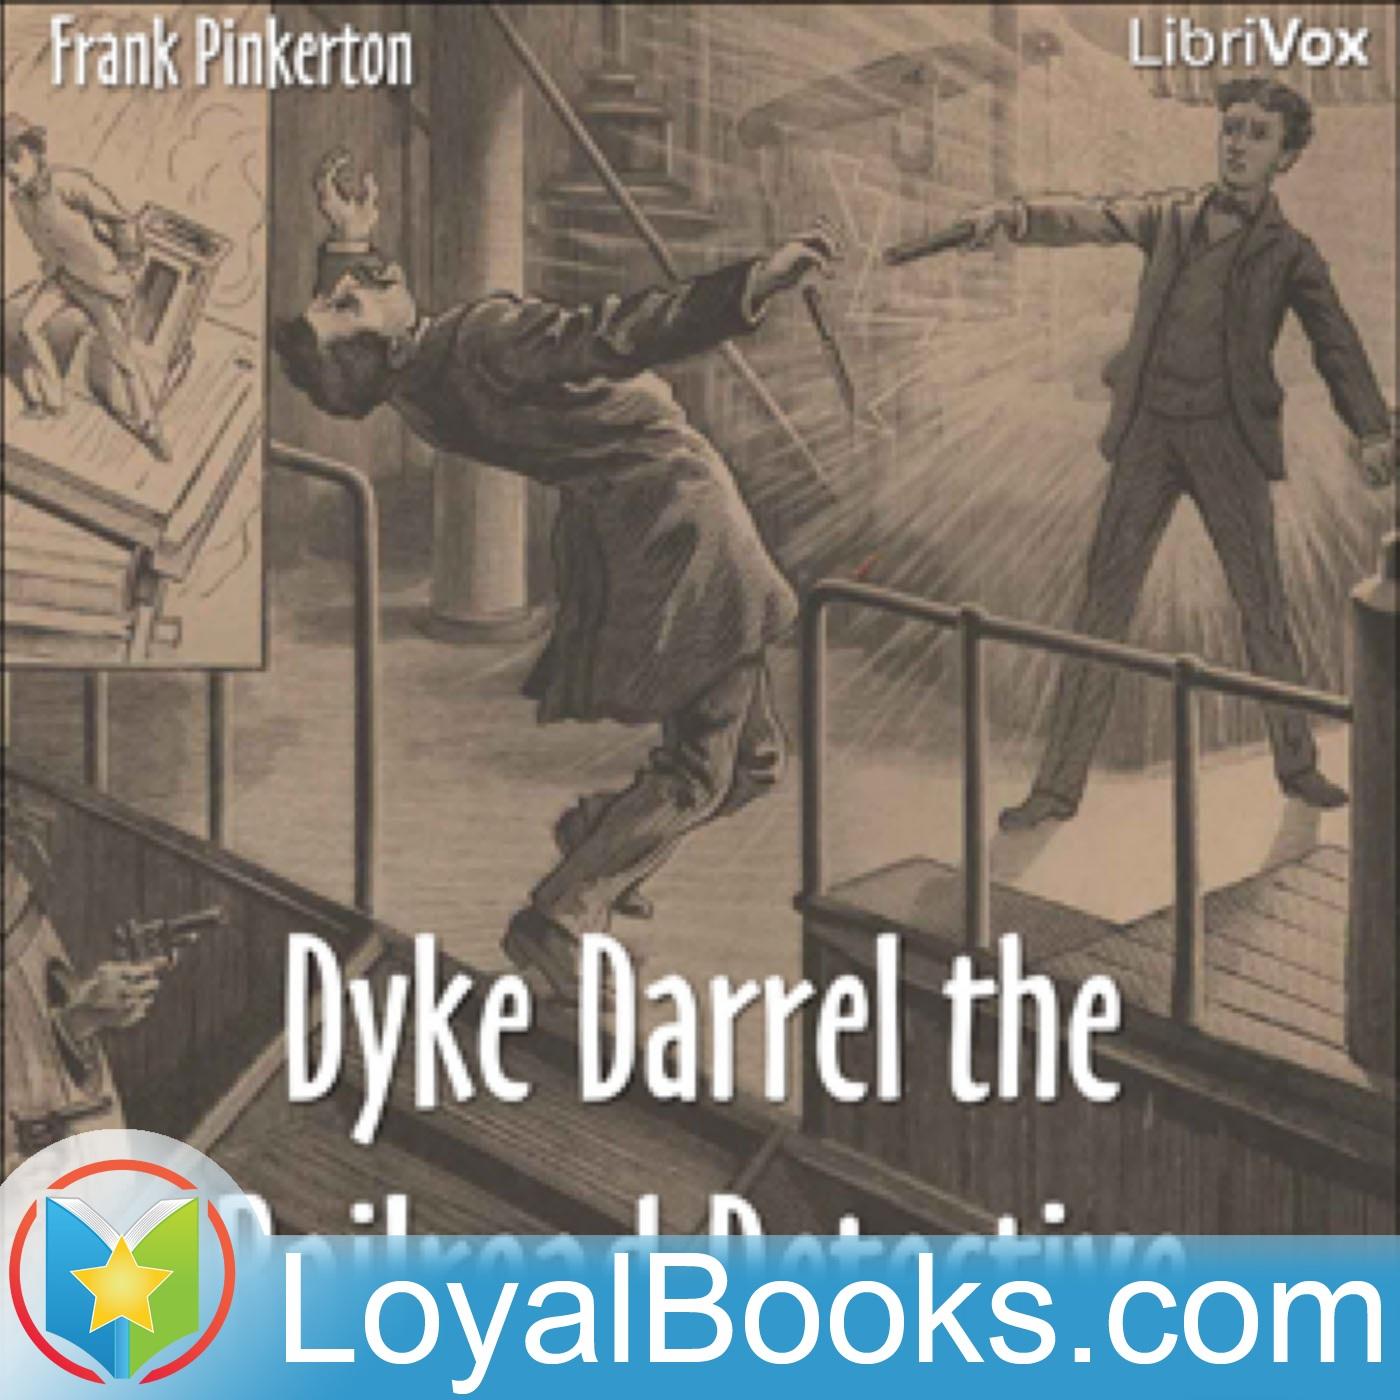 <![CDATA[Dyke Darrel the Railroad Detective by Frank Pinkerton]]>